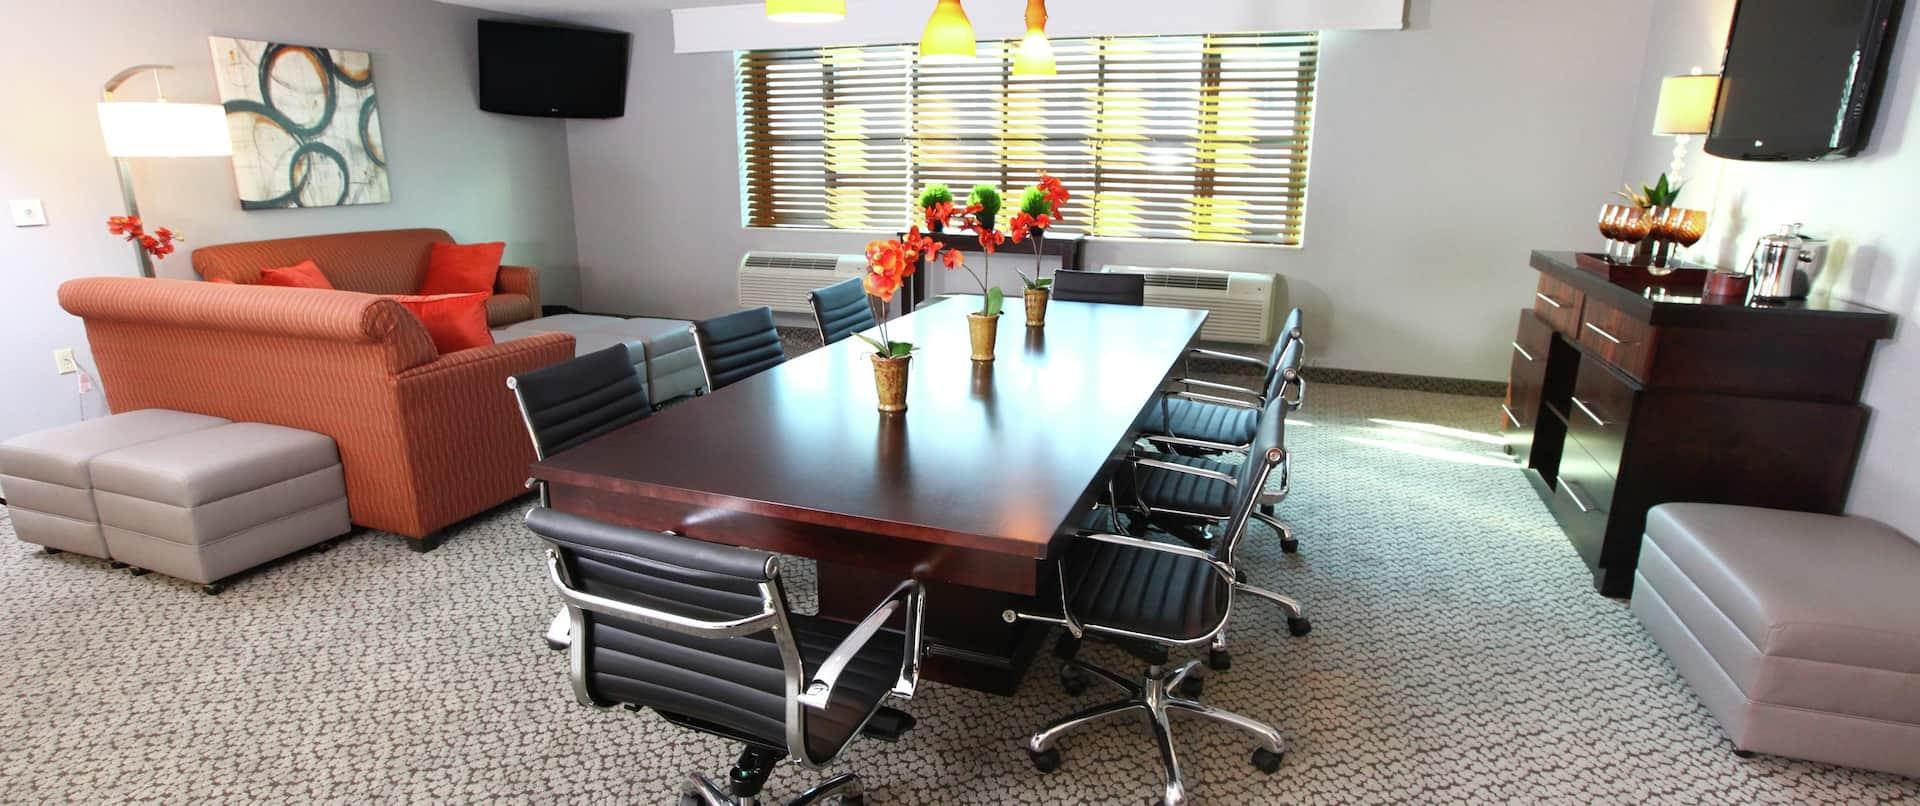 Capital Room